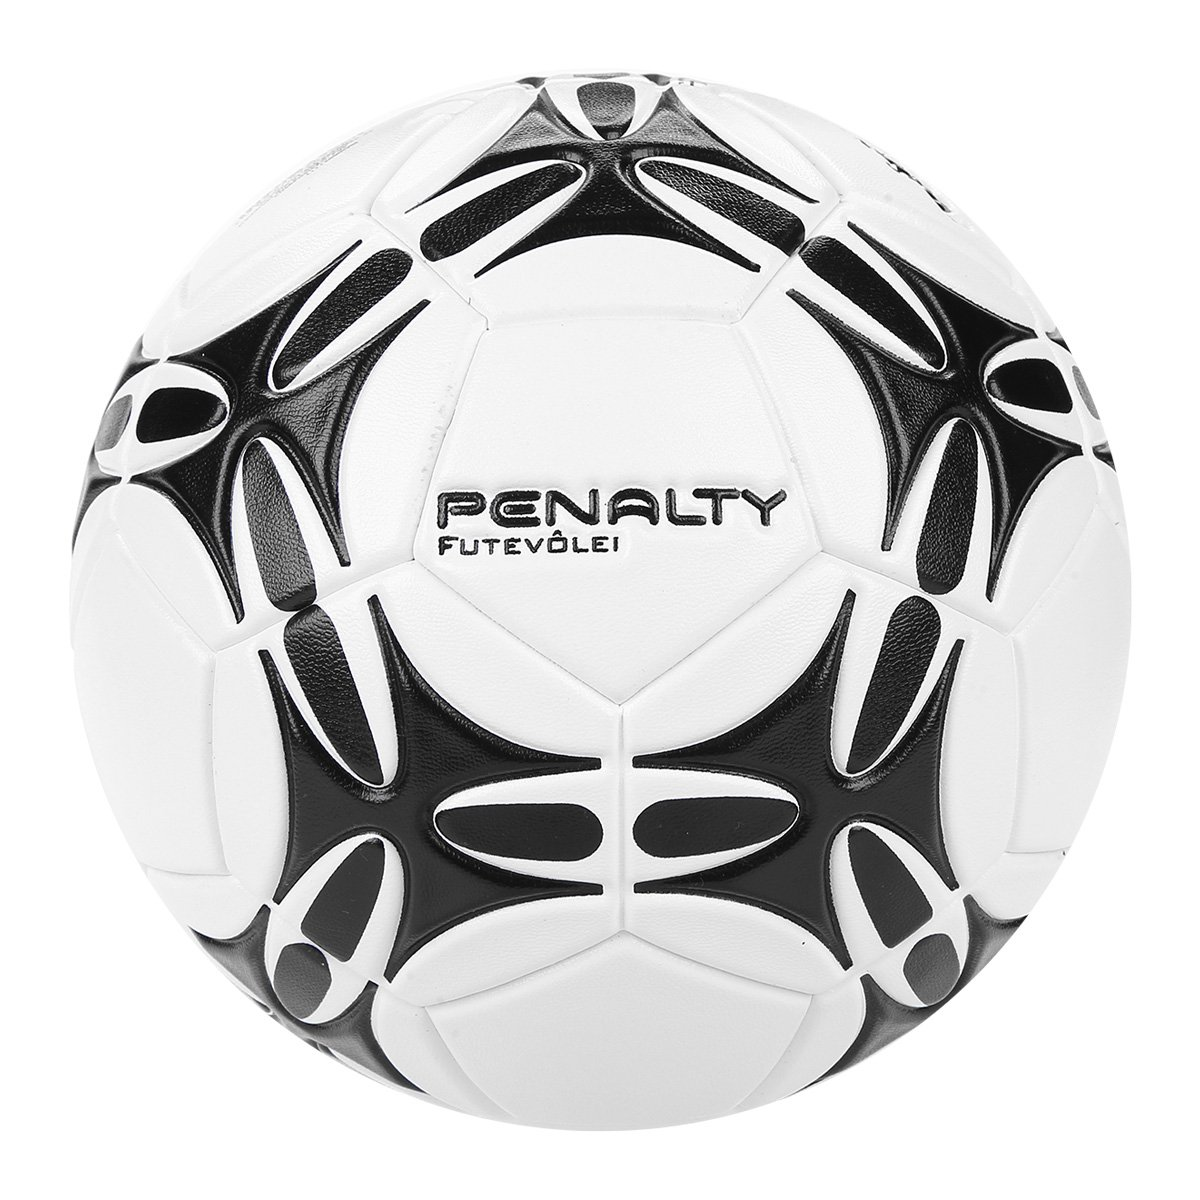 1fedf462e Bola de Futevolei Penalty Pro VIII